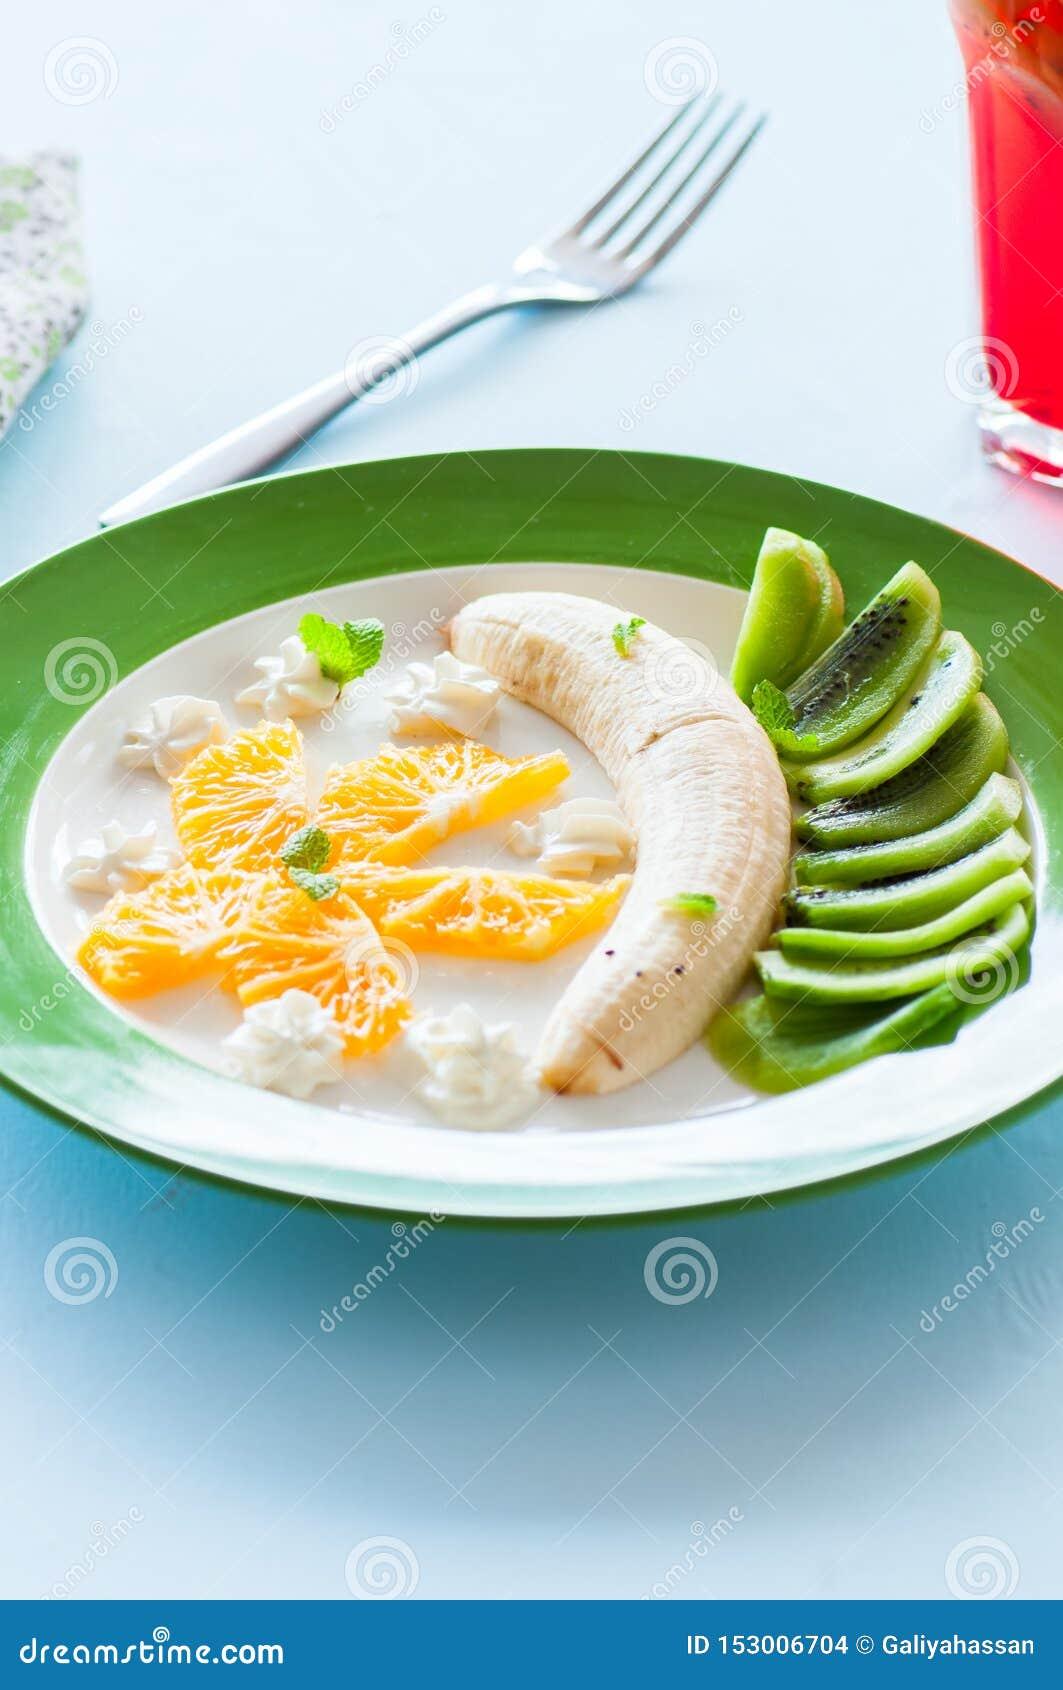 Fruit snack meal for children. Banana, kiwi and orange slices.